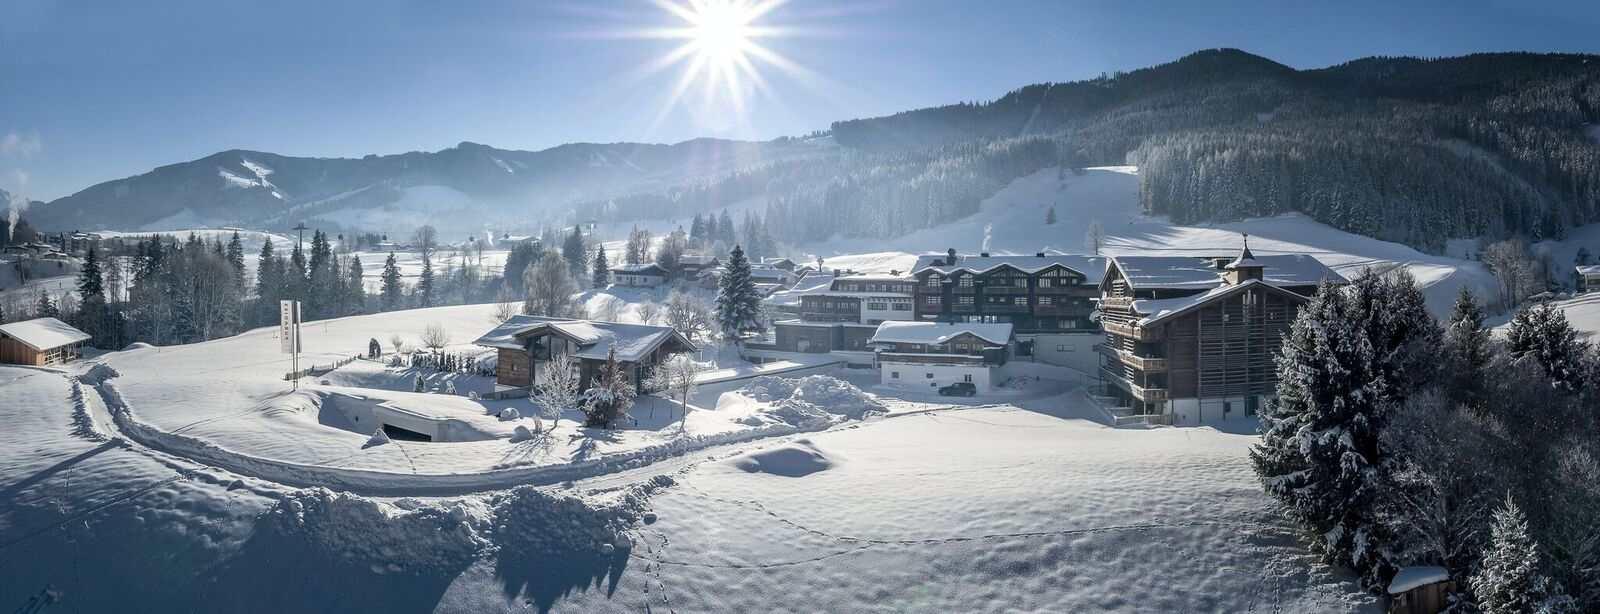 winterlandschaft_panorama_puradies_preview.jpg